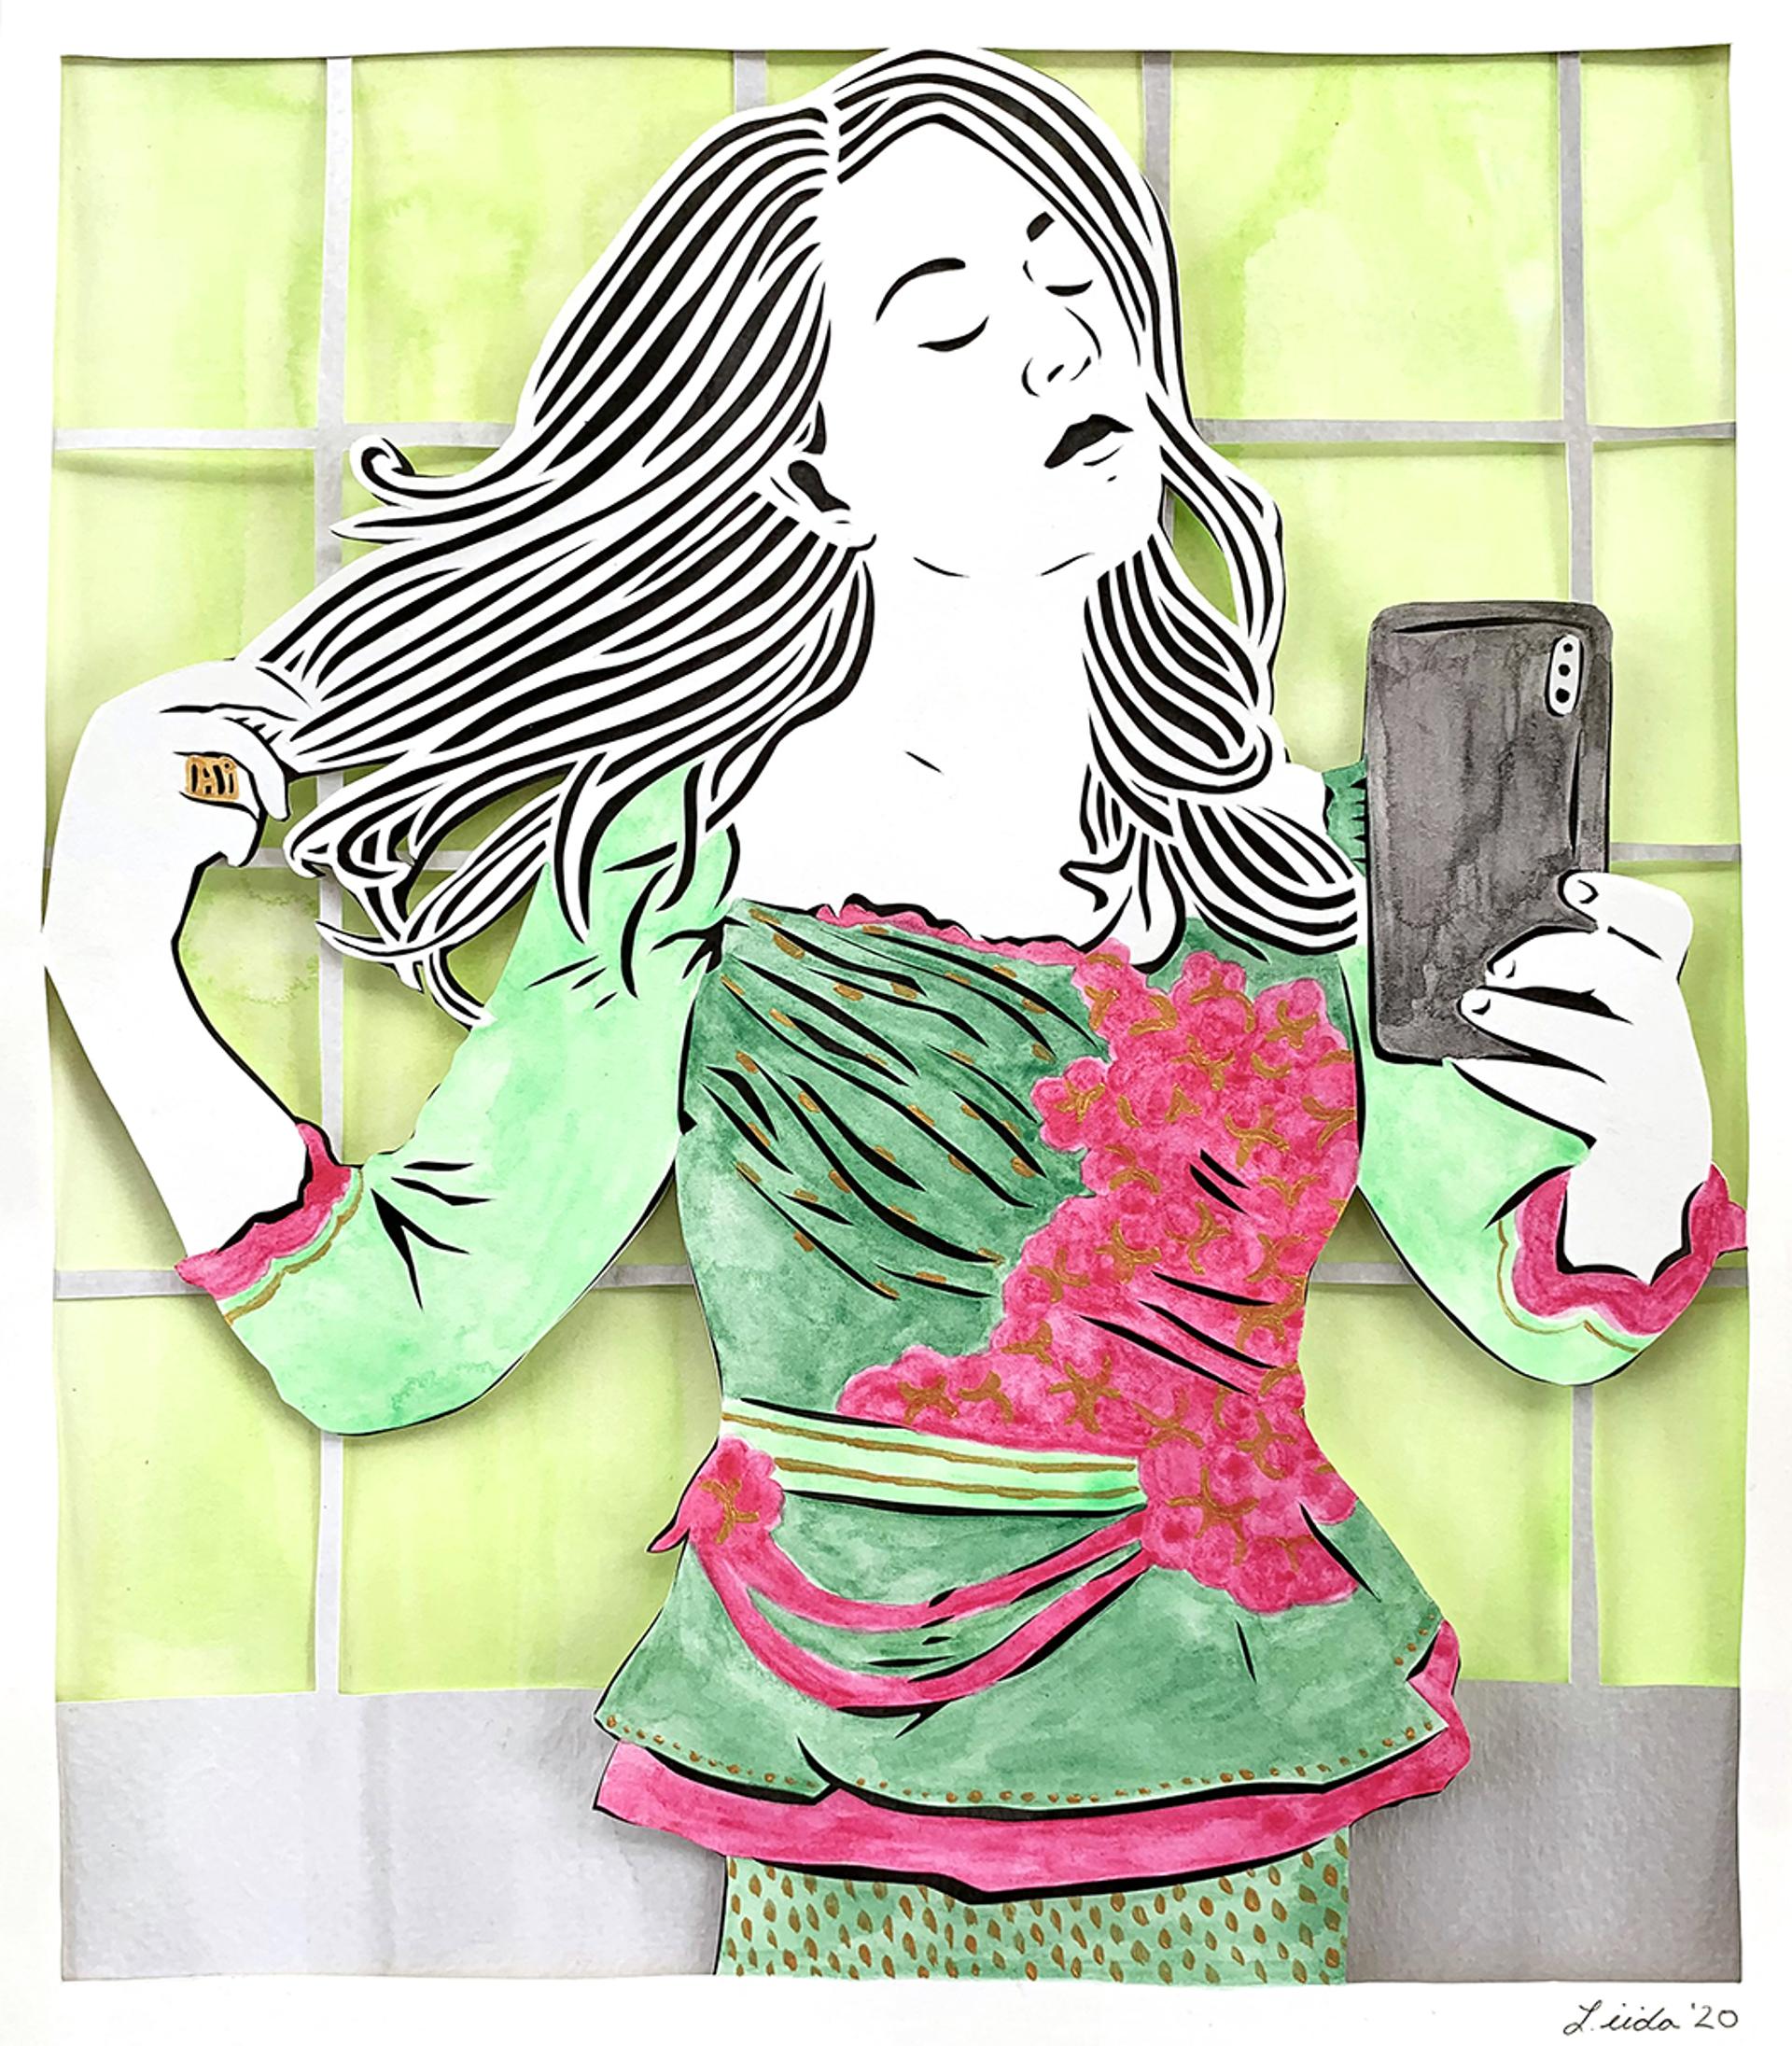 32. Strolling: The Appearance of Self by Lauren Iida